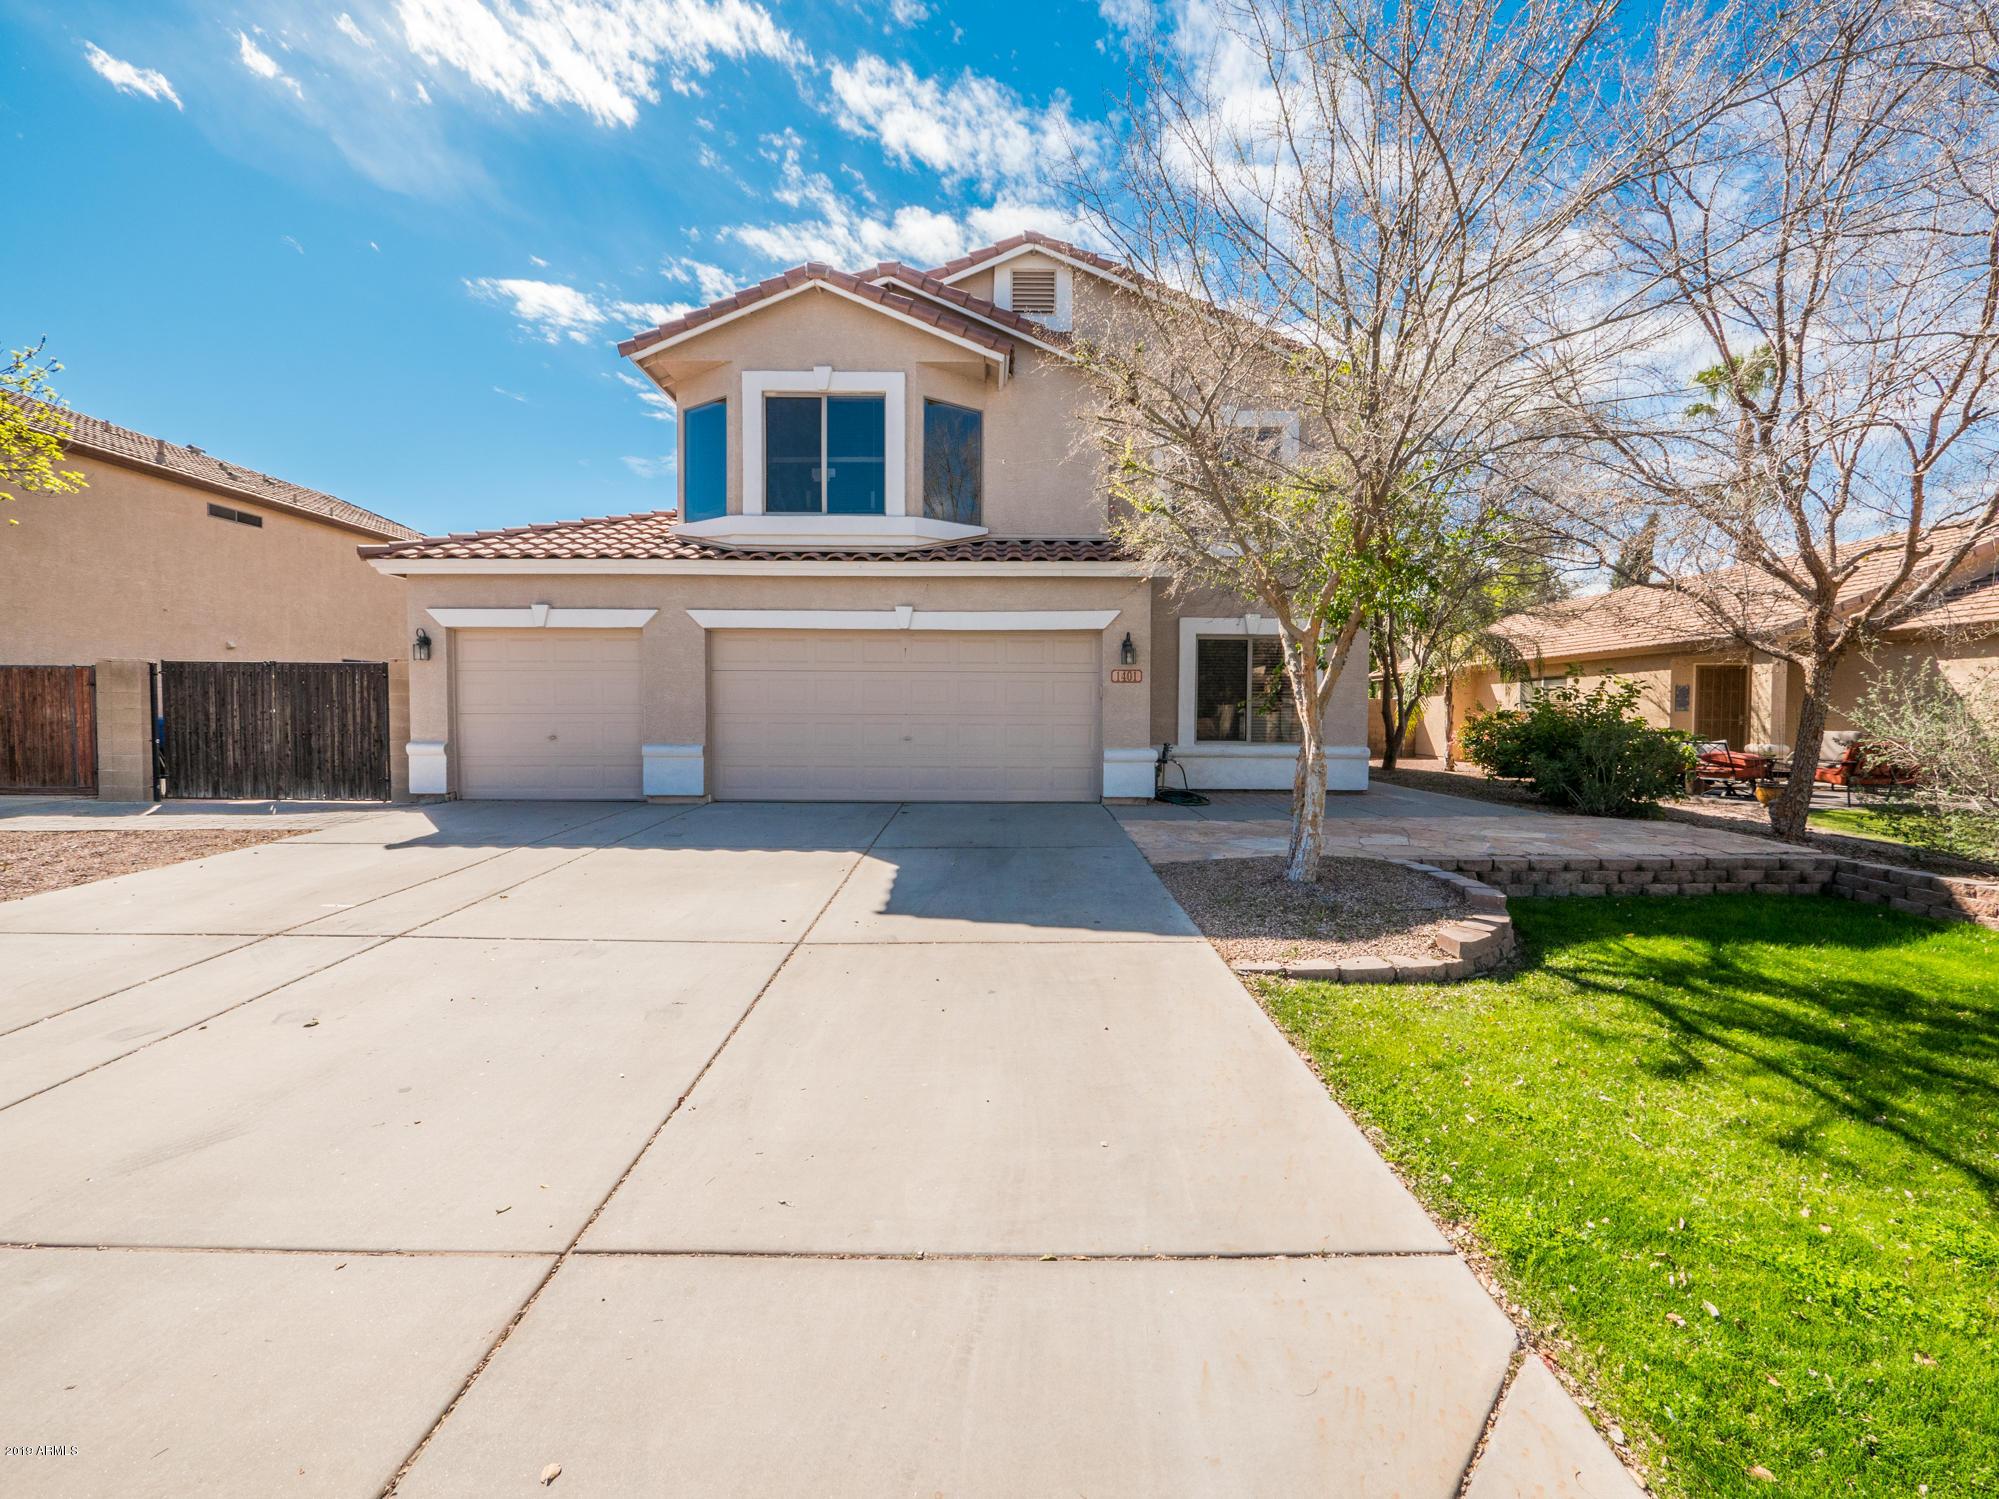 Photo of 1401 E SHEFFIELD Avenue, Gilbert, AZ 85296